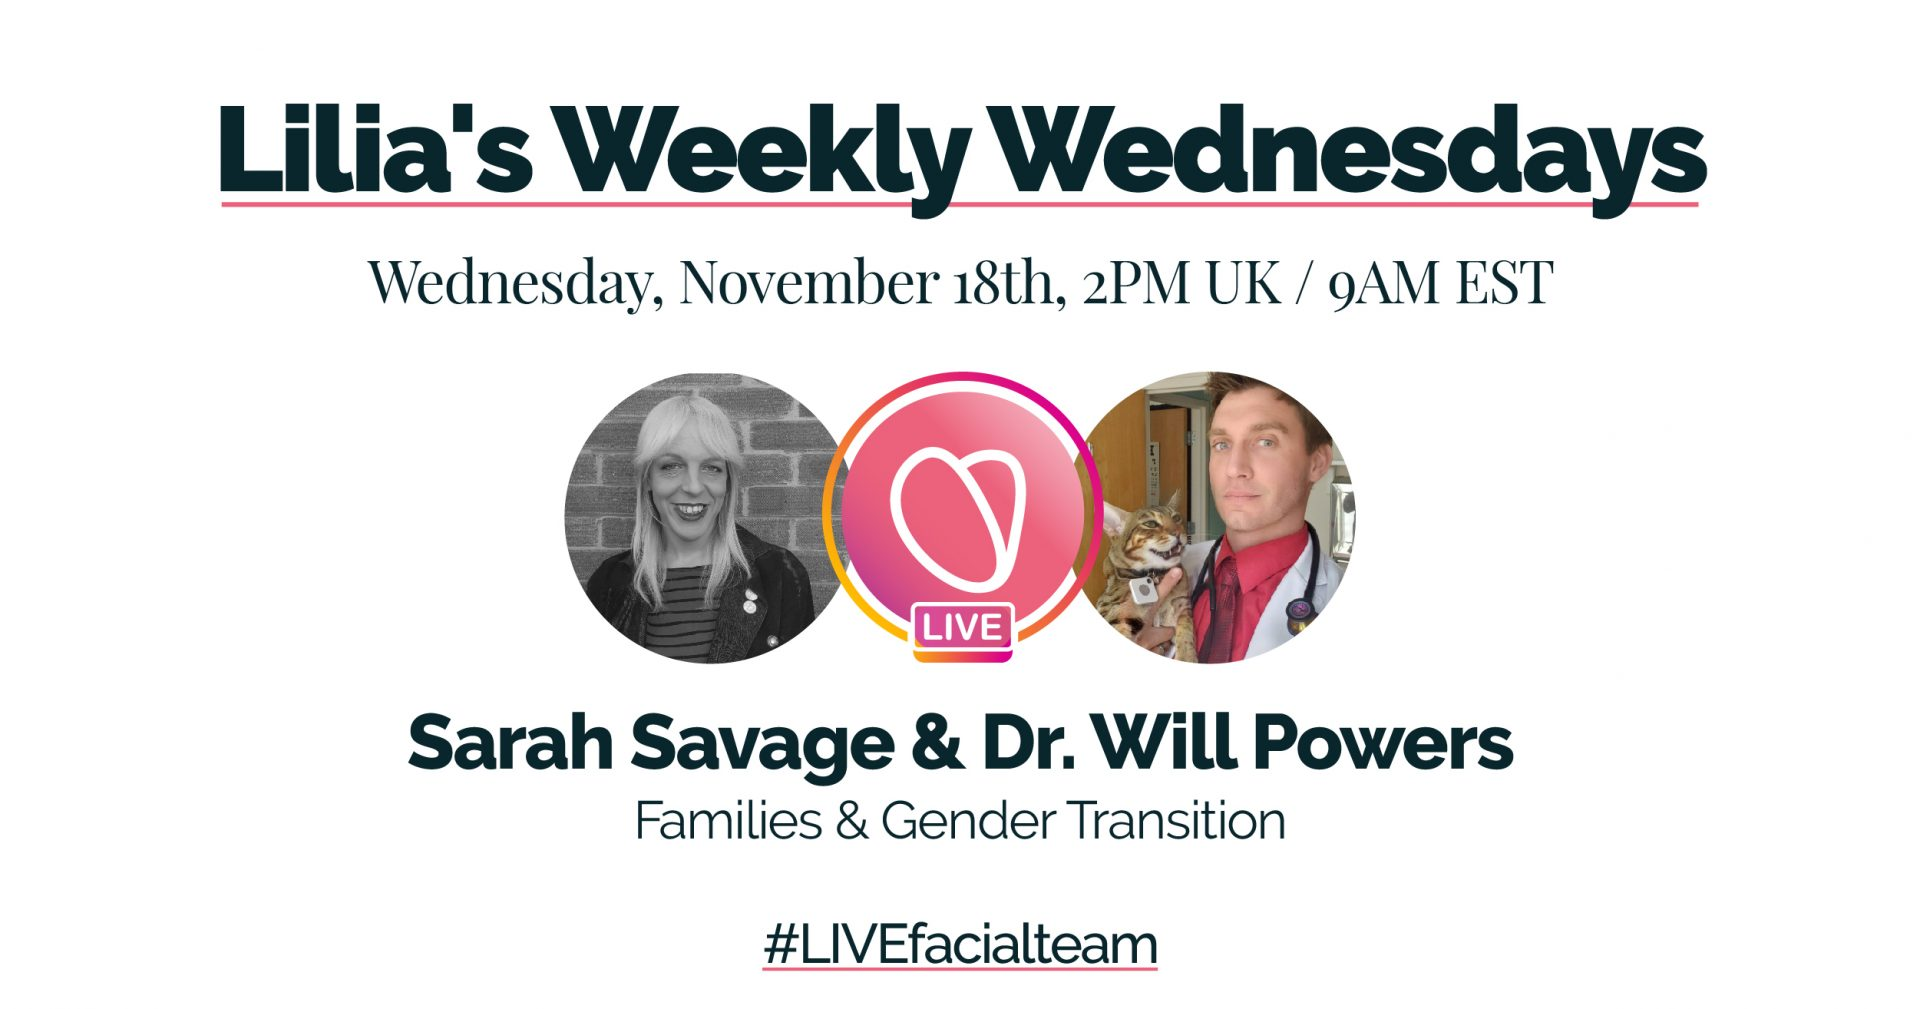 Lilia's Livestreams 2020 | Almost Weekly Wednesdays!